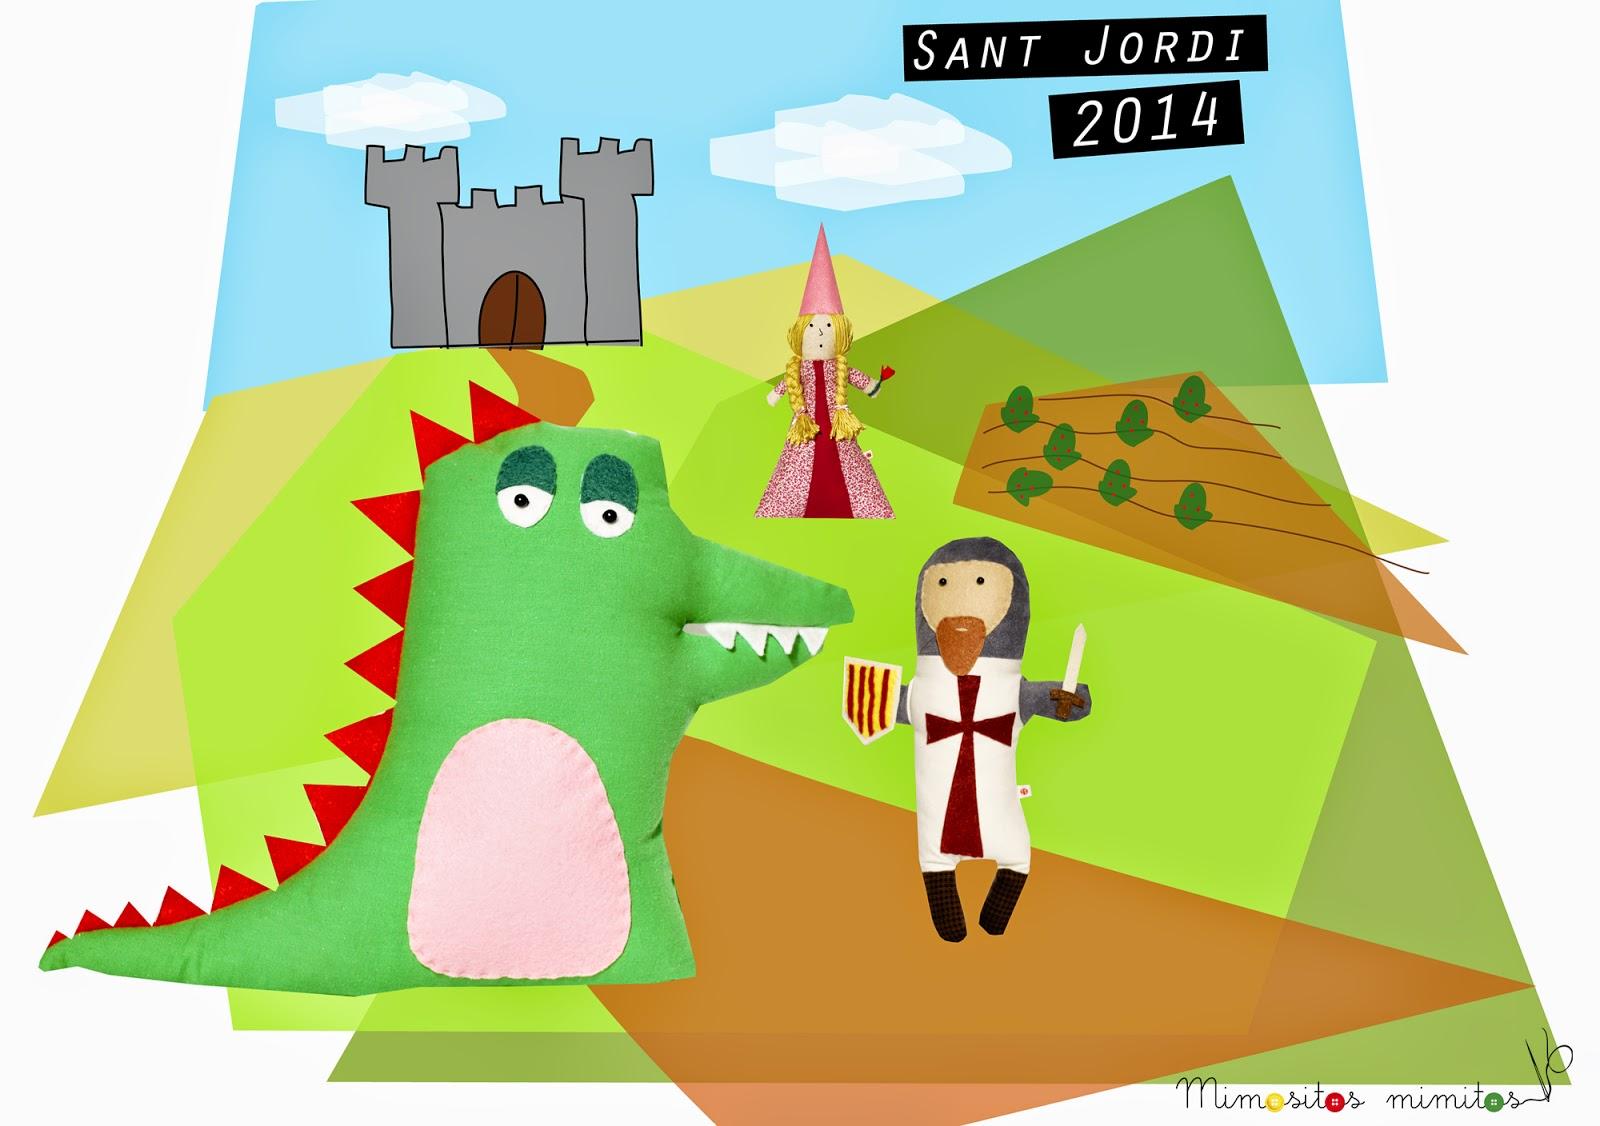 sant jordi 2014 leyenda princesa caballero rosa dragón enamorados Cervantes Shakespeare cavaller drac llegenda